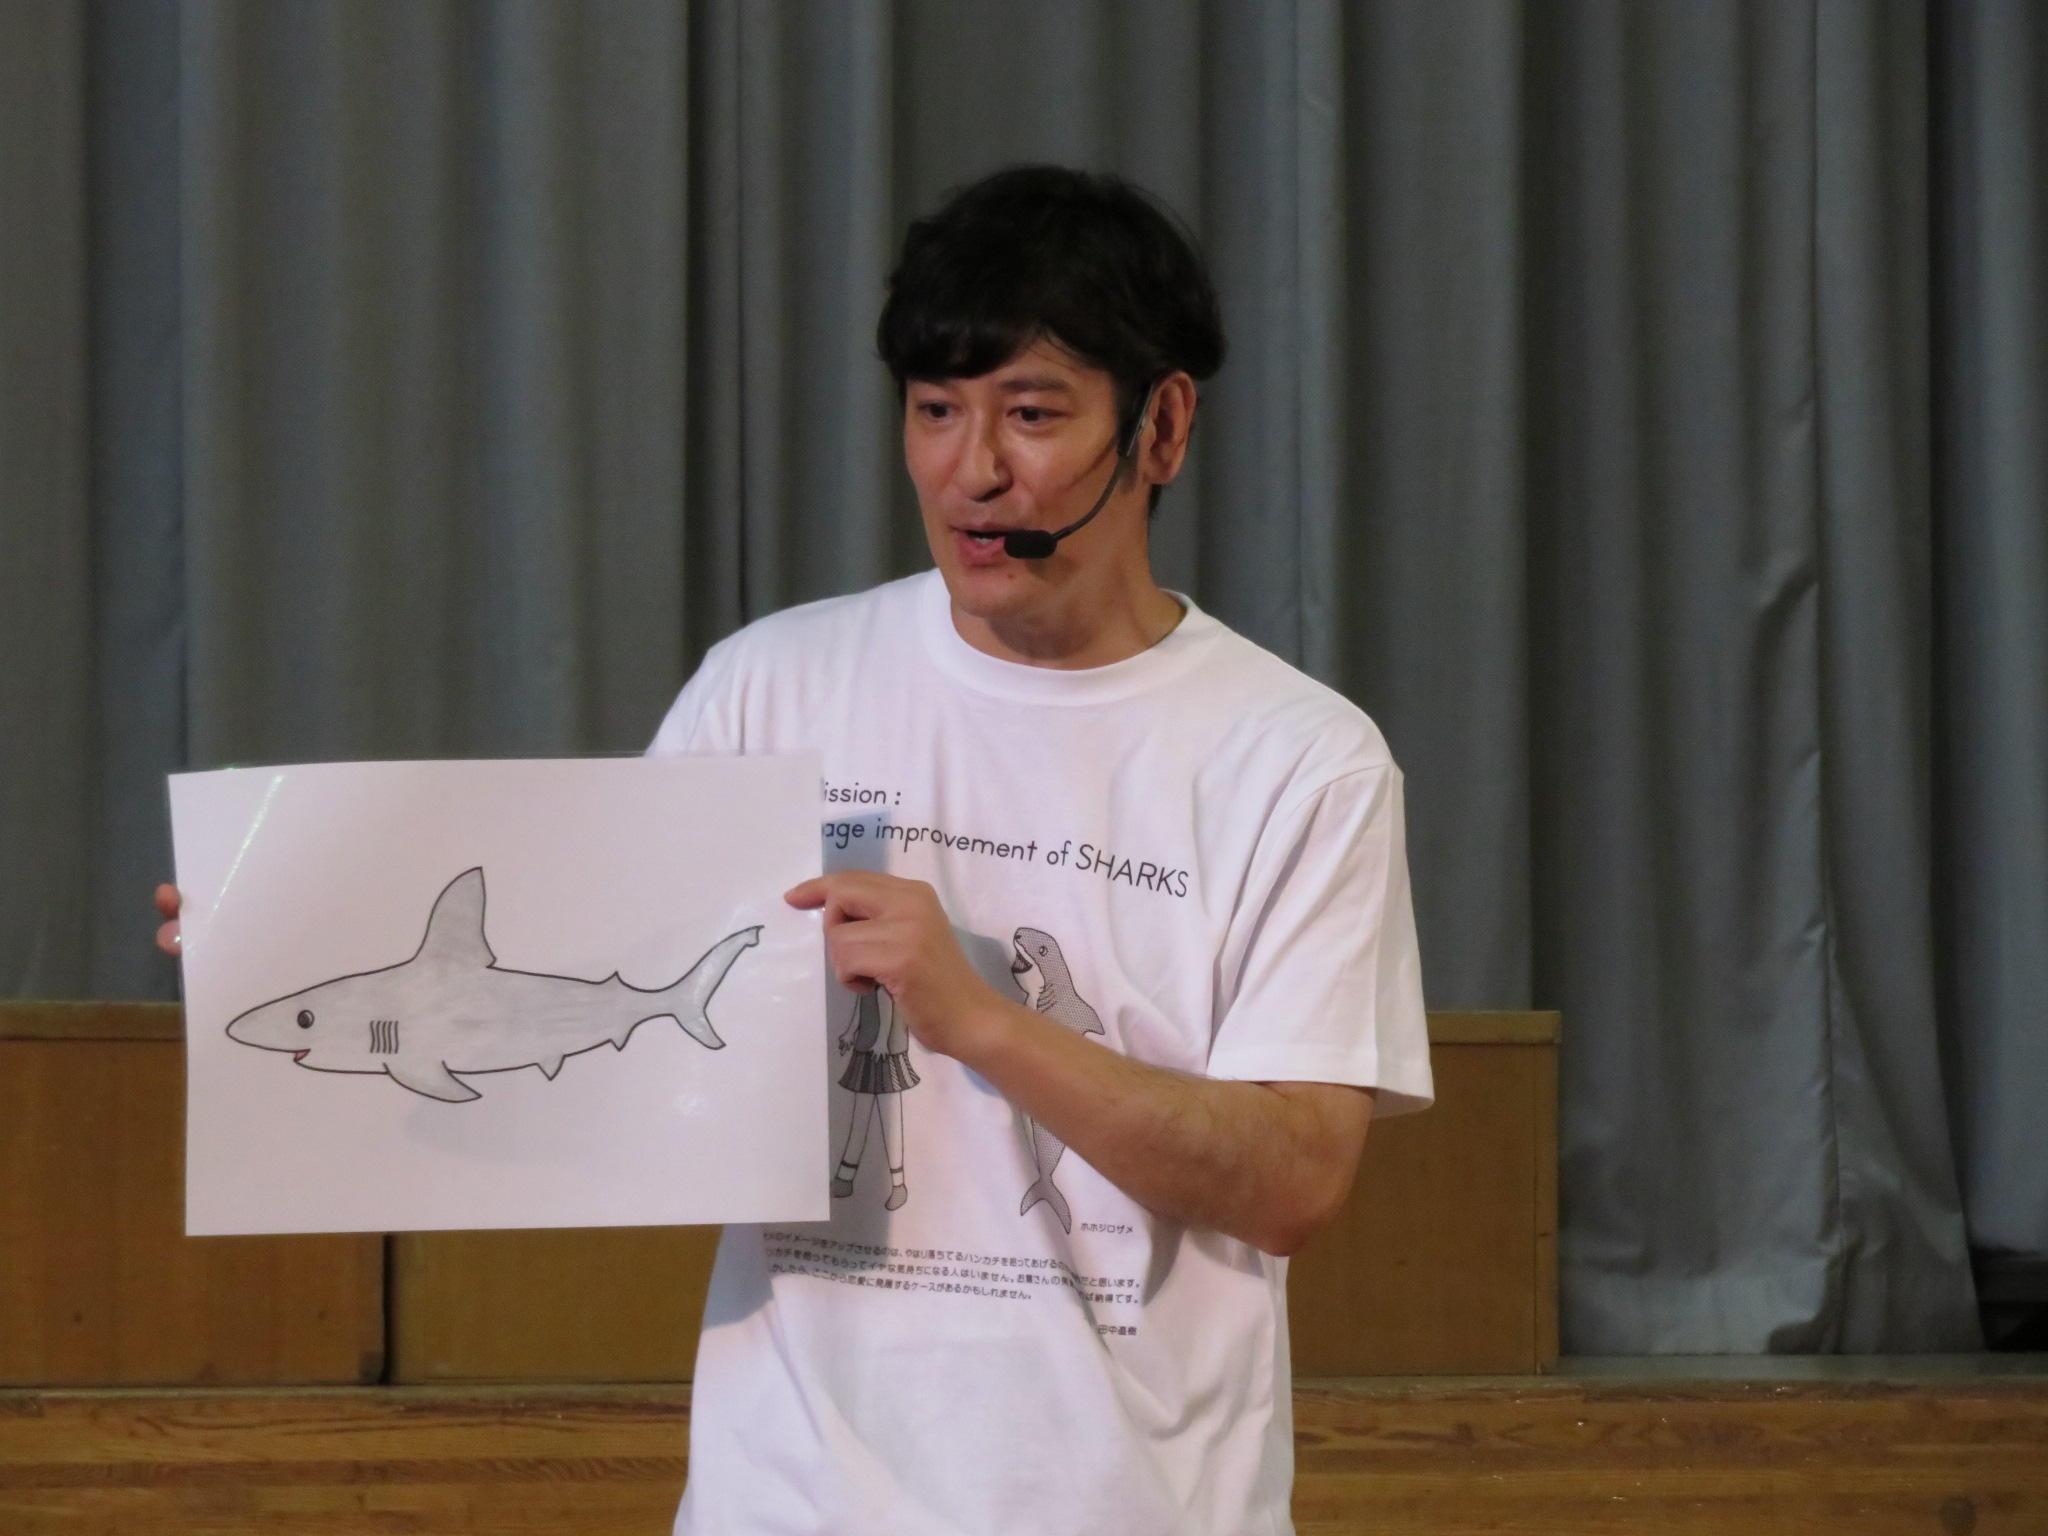 http://news.yoshimoto.co.jp/20181010022737-f25fabd98a6c4aed4618eca3b71e9cf96e63ff0a.jpg